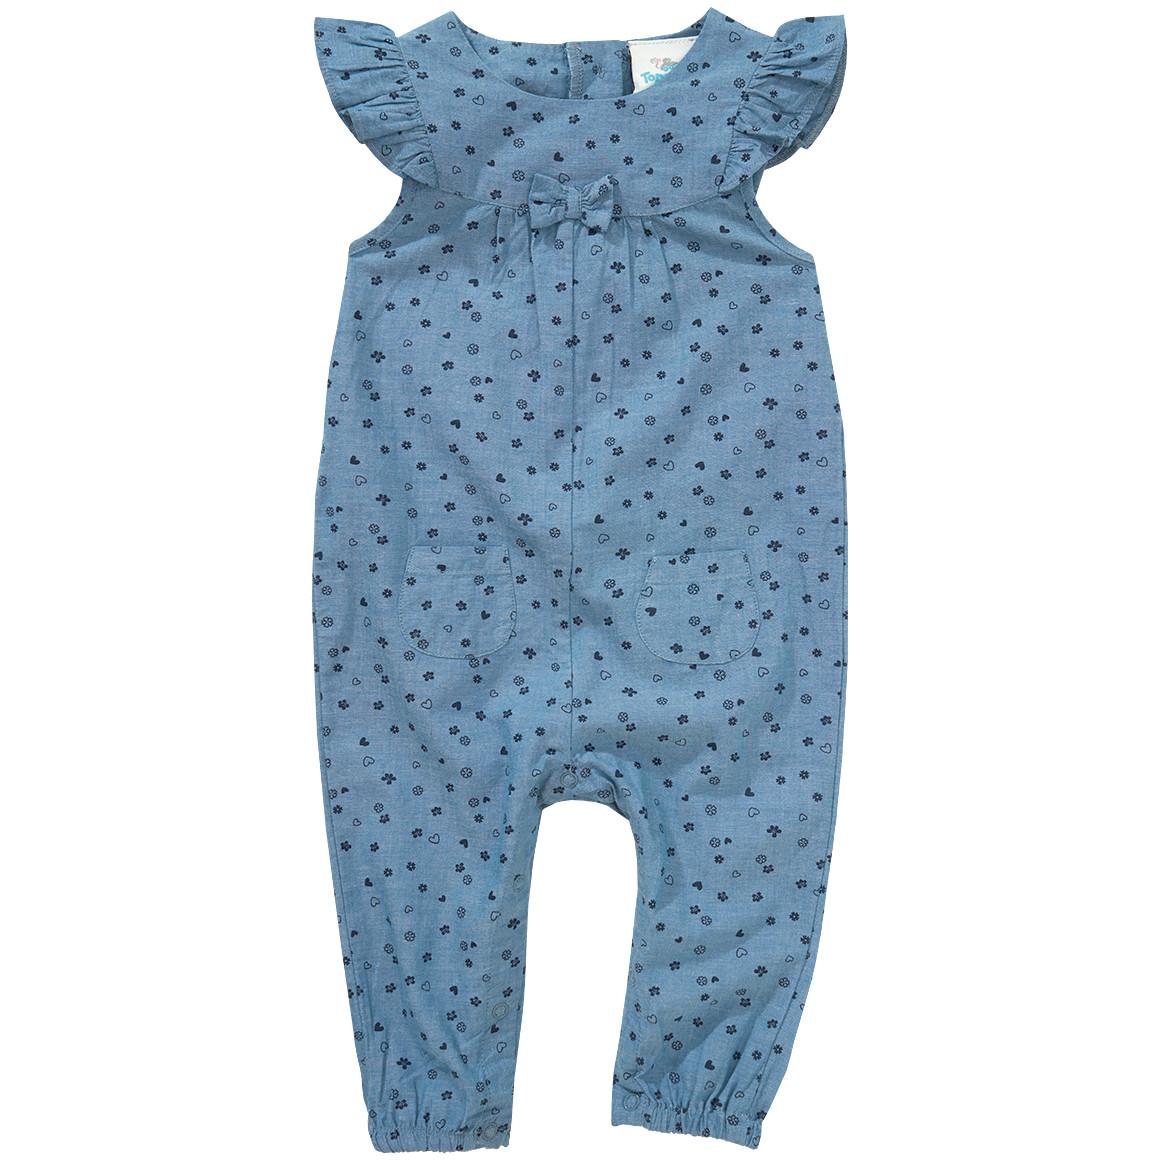 Baby Overall in Jeans Optik